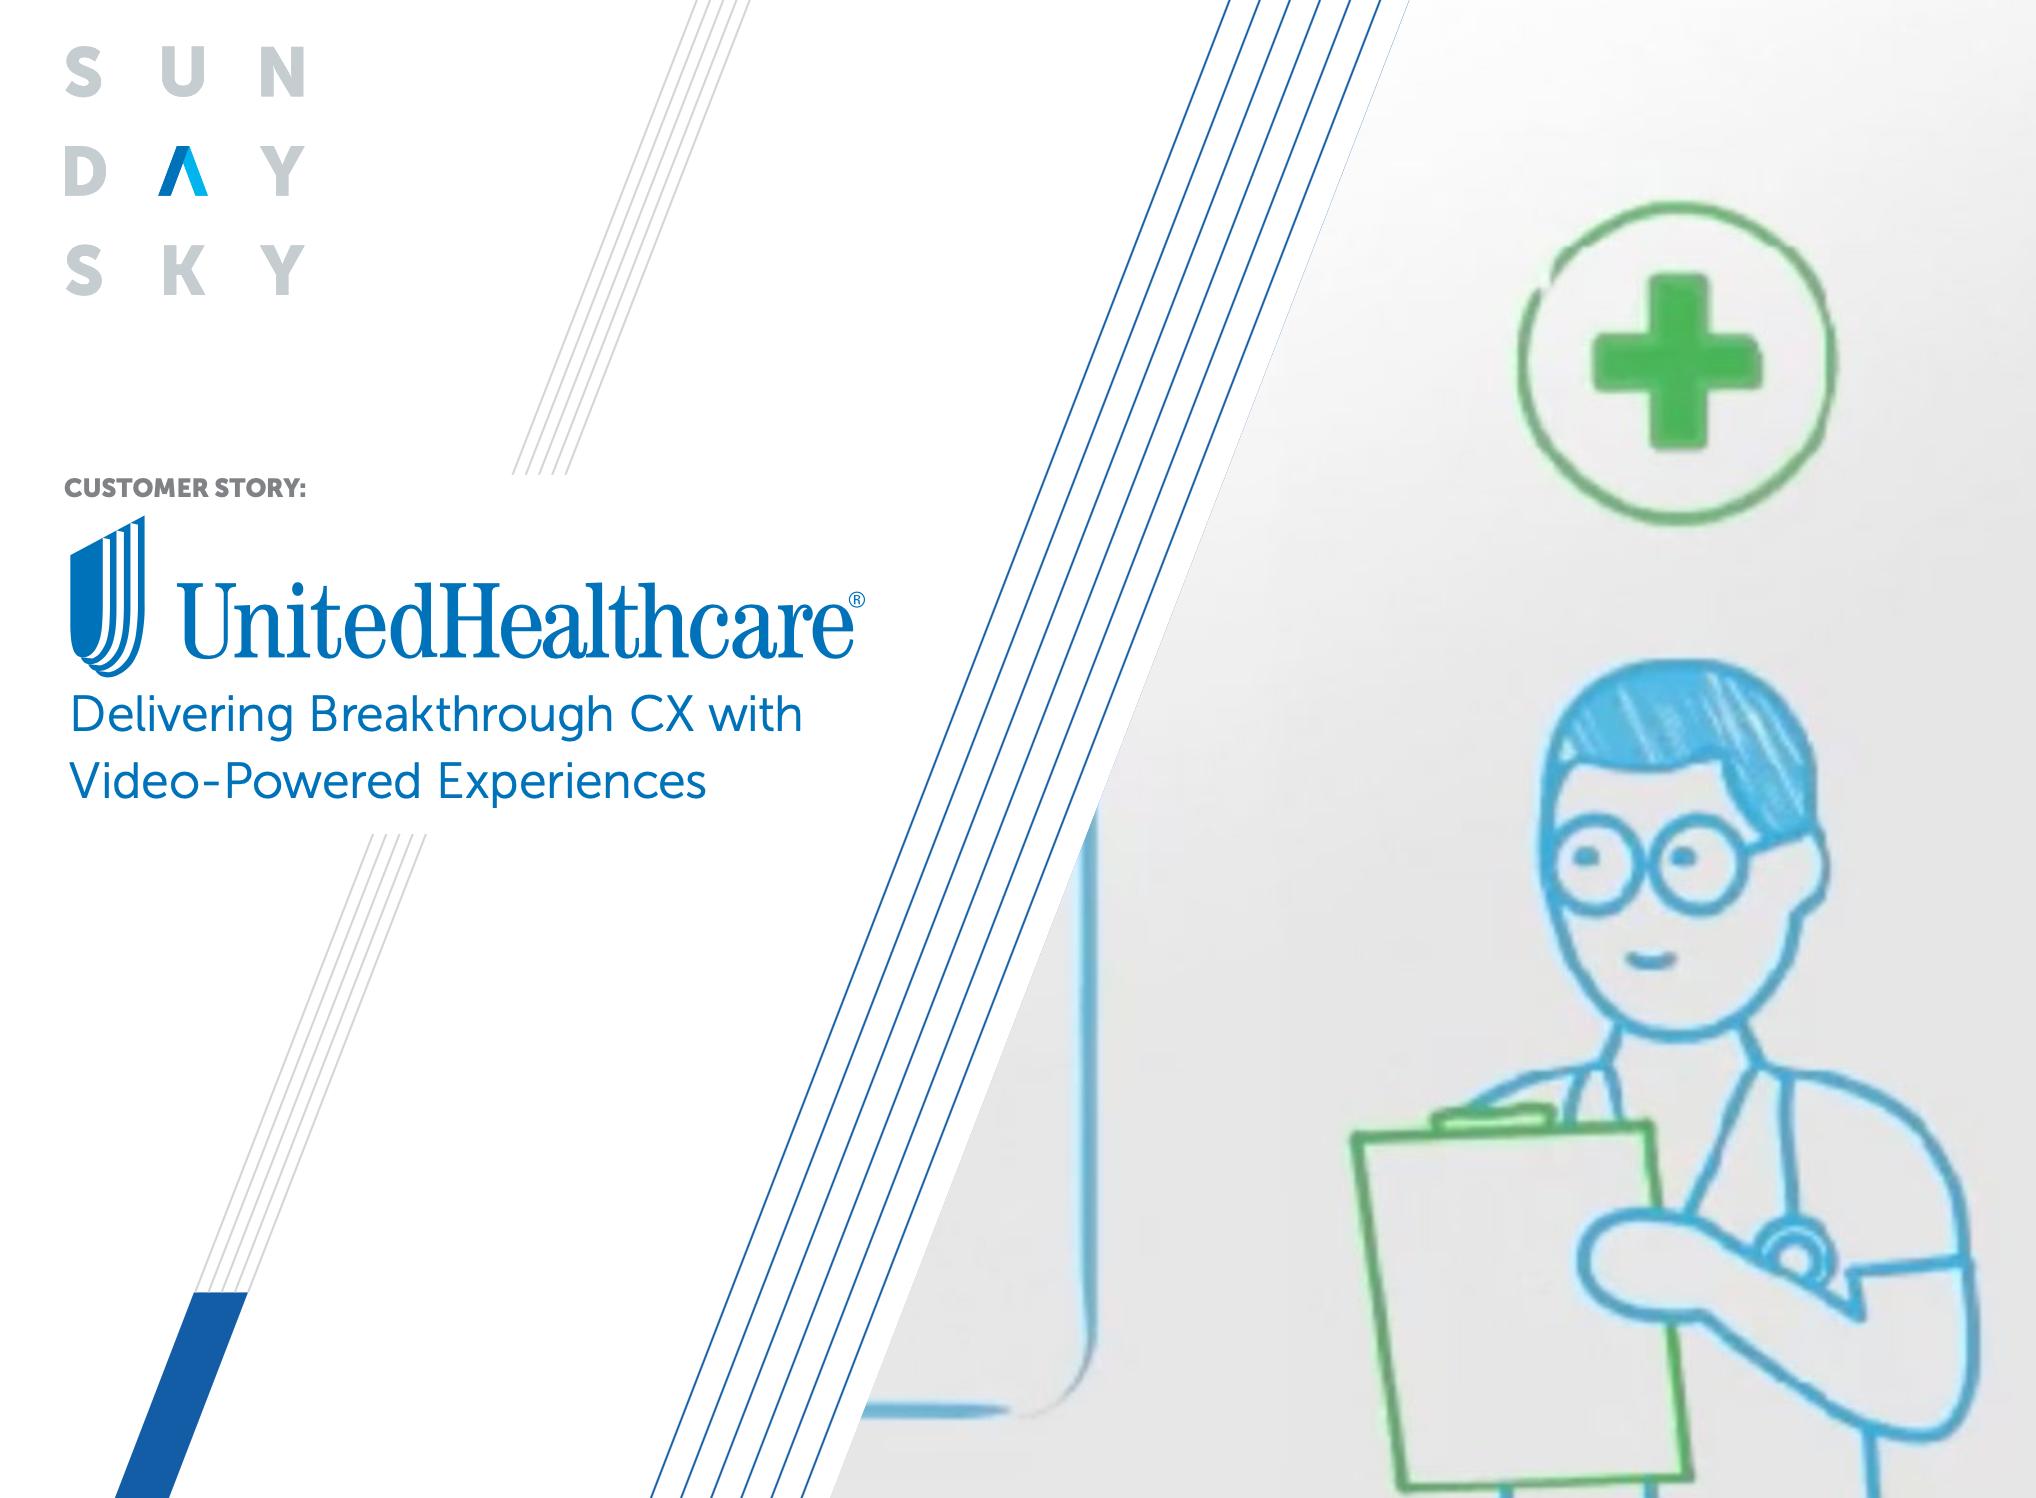 Download UnitedHealthcare case study